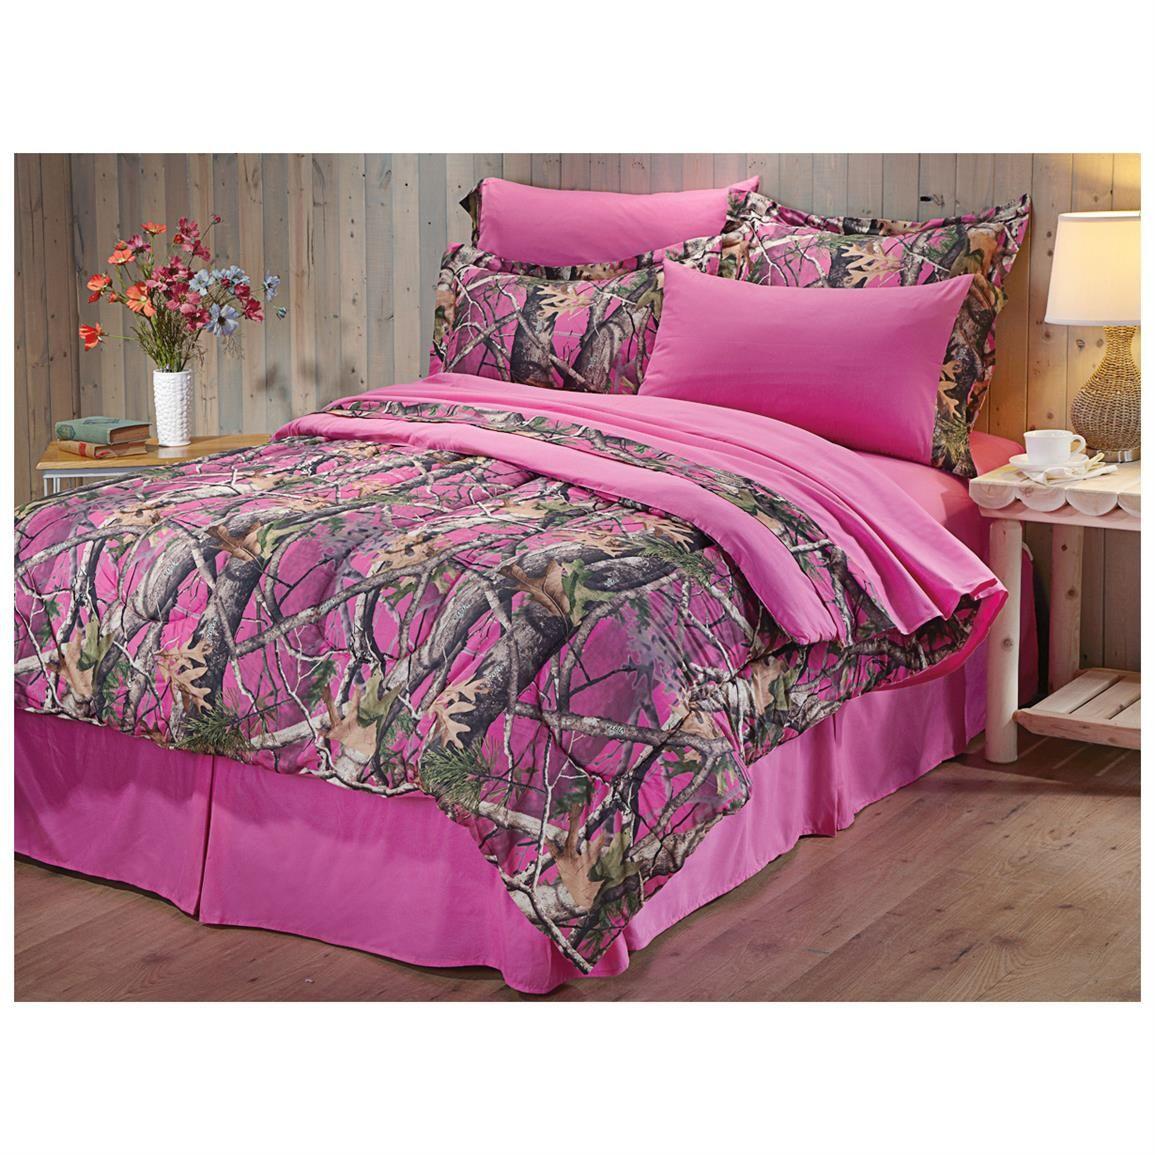 Castlecreek Next Vista Pink Camo Complete Bed Set Pink Camo